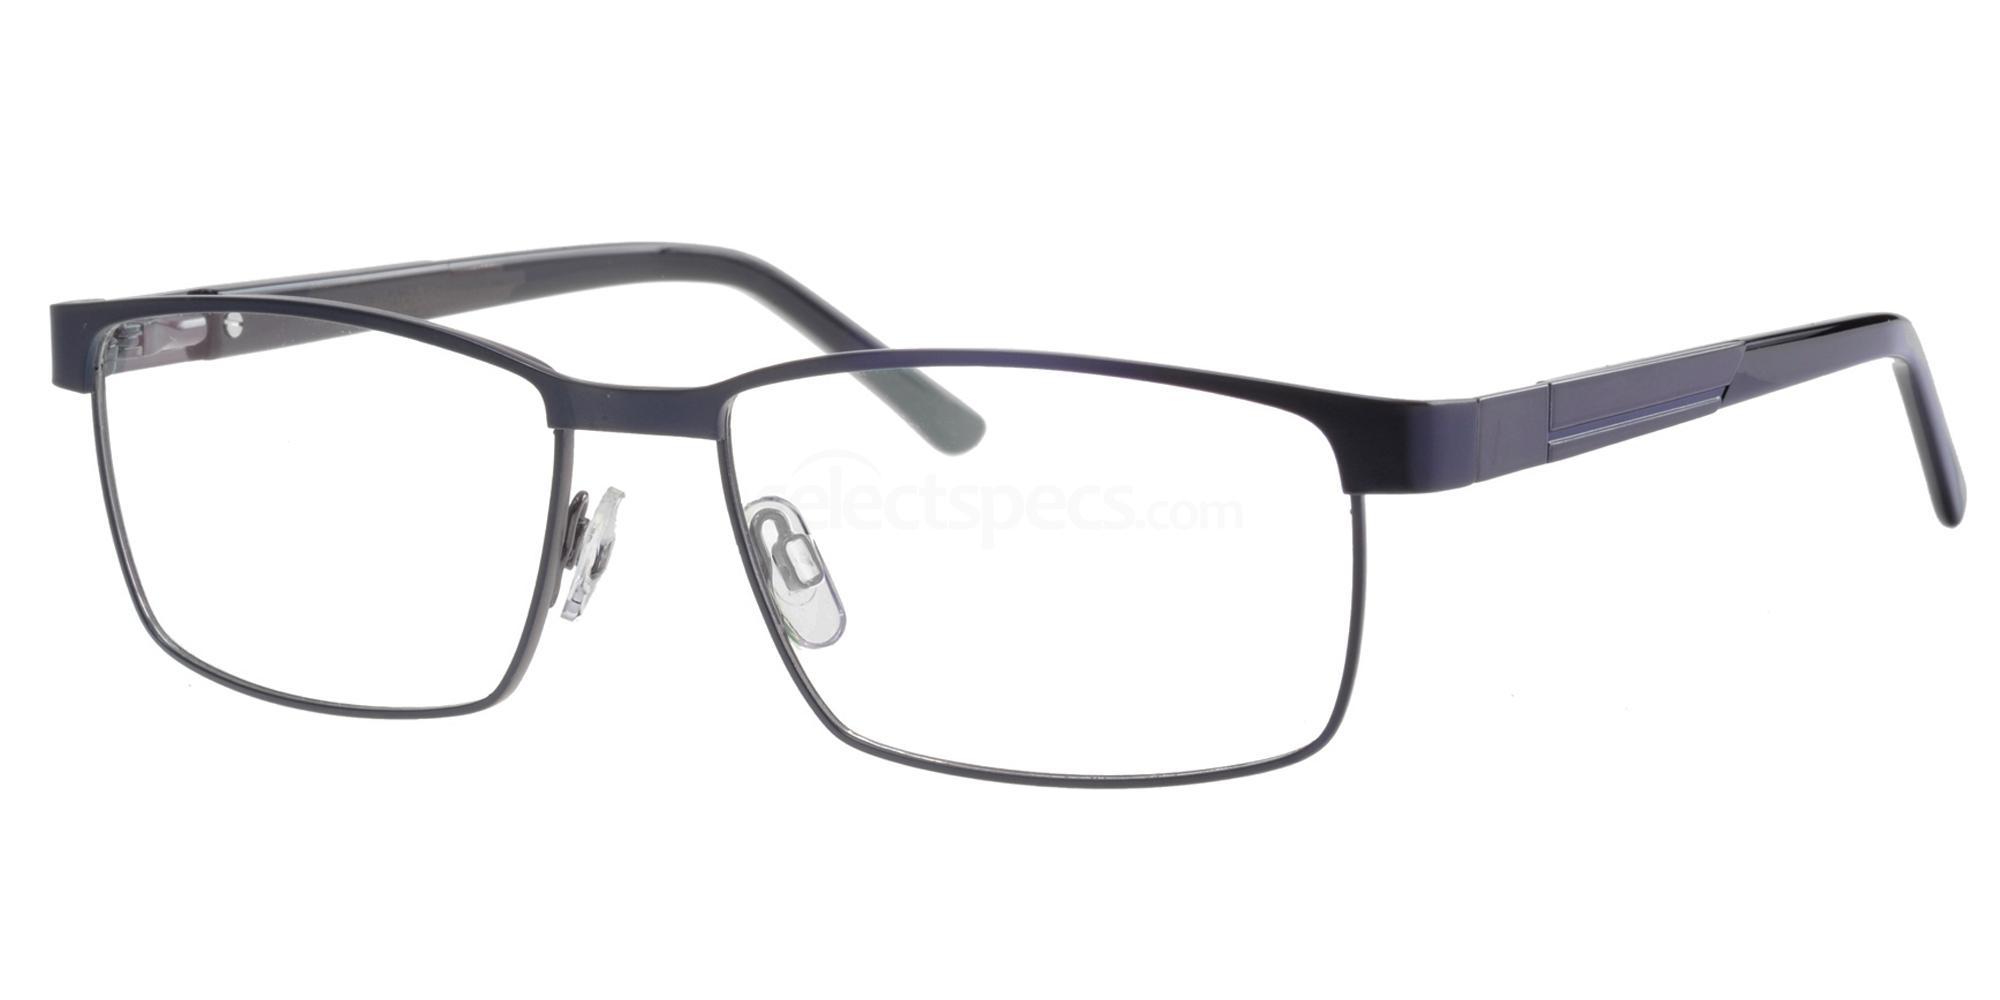 C01 3538 Glasses, Colt for Men